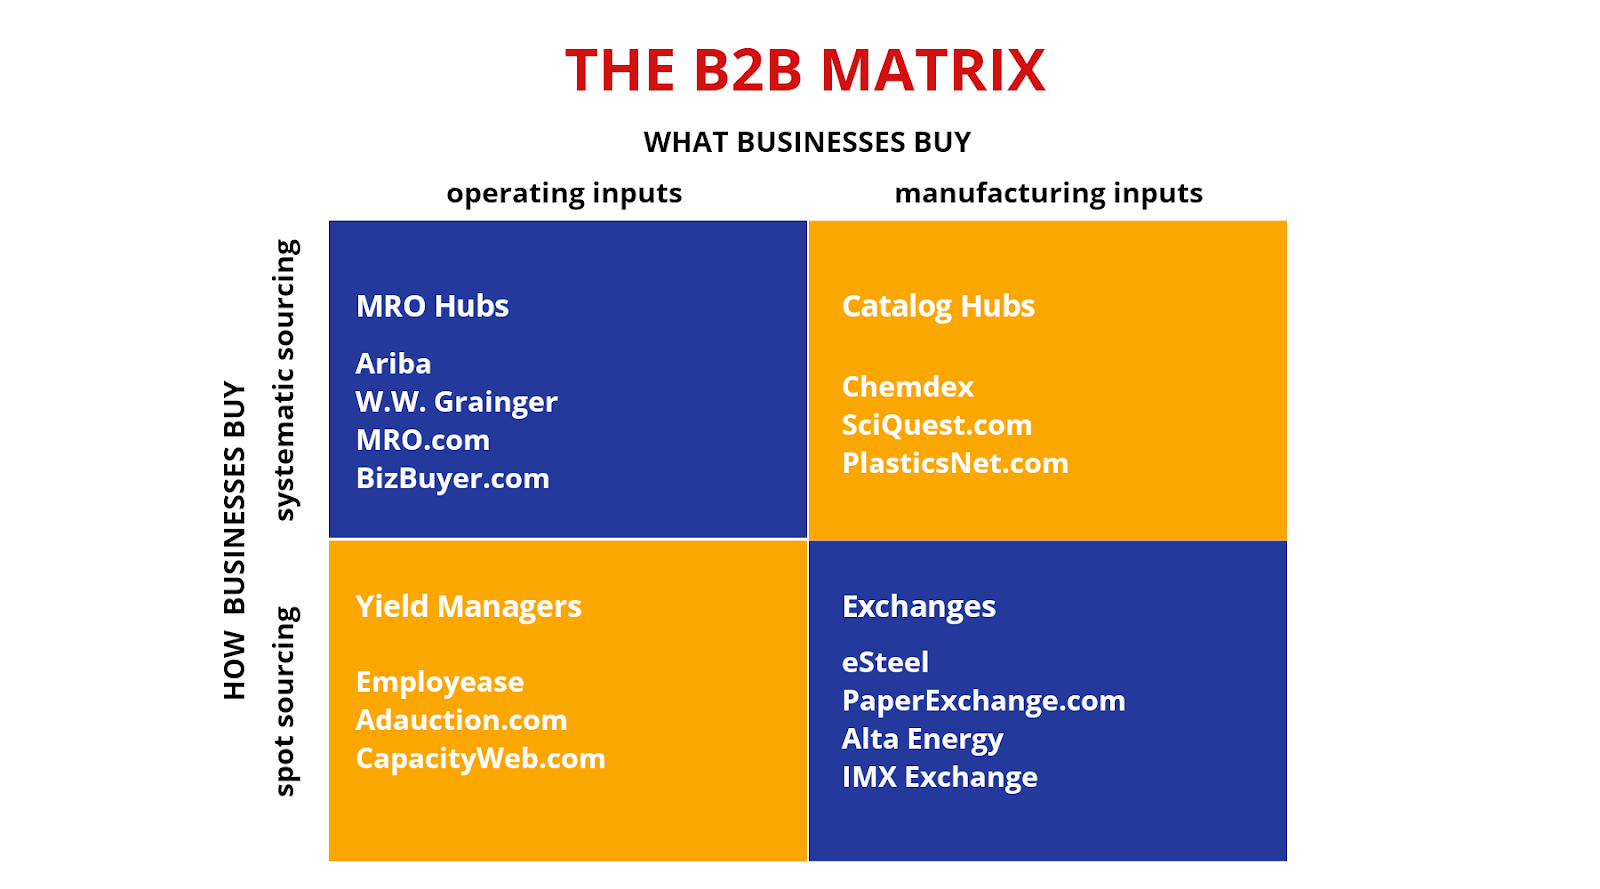 B2B Matrix